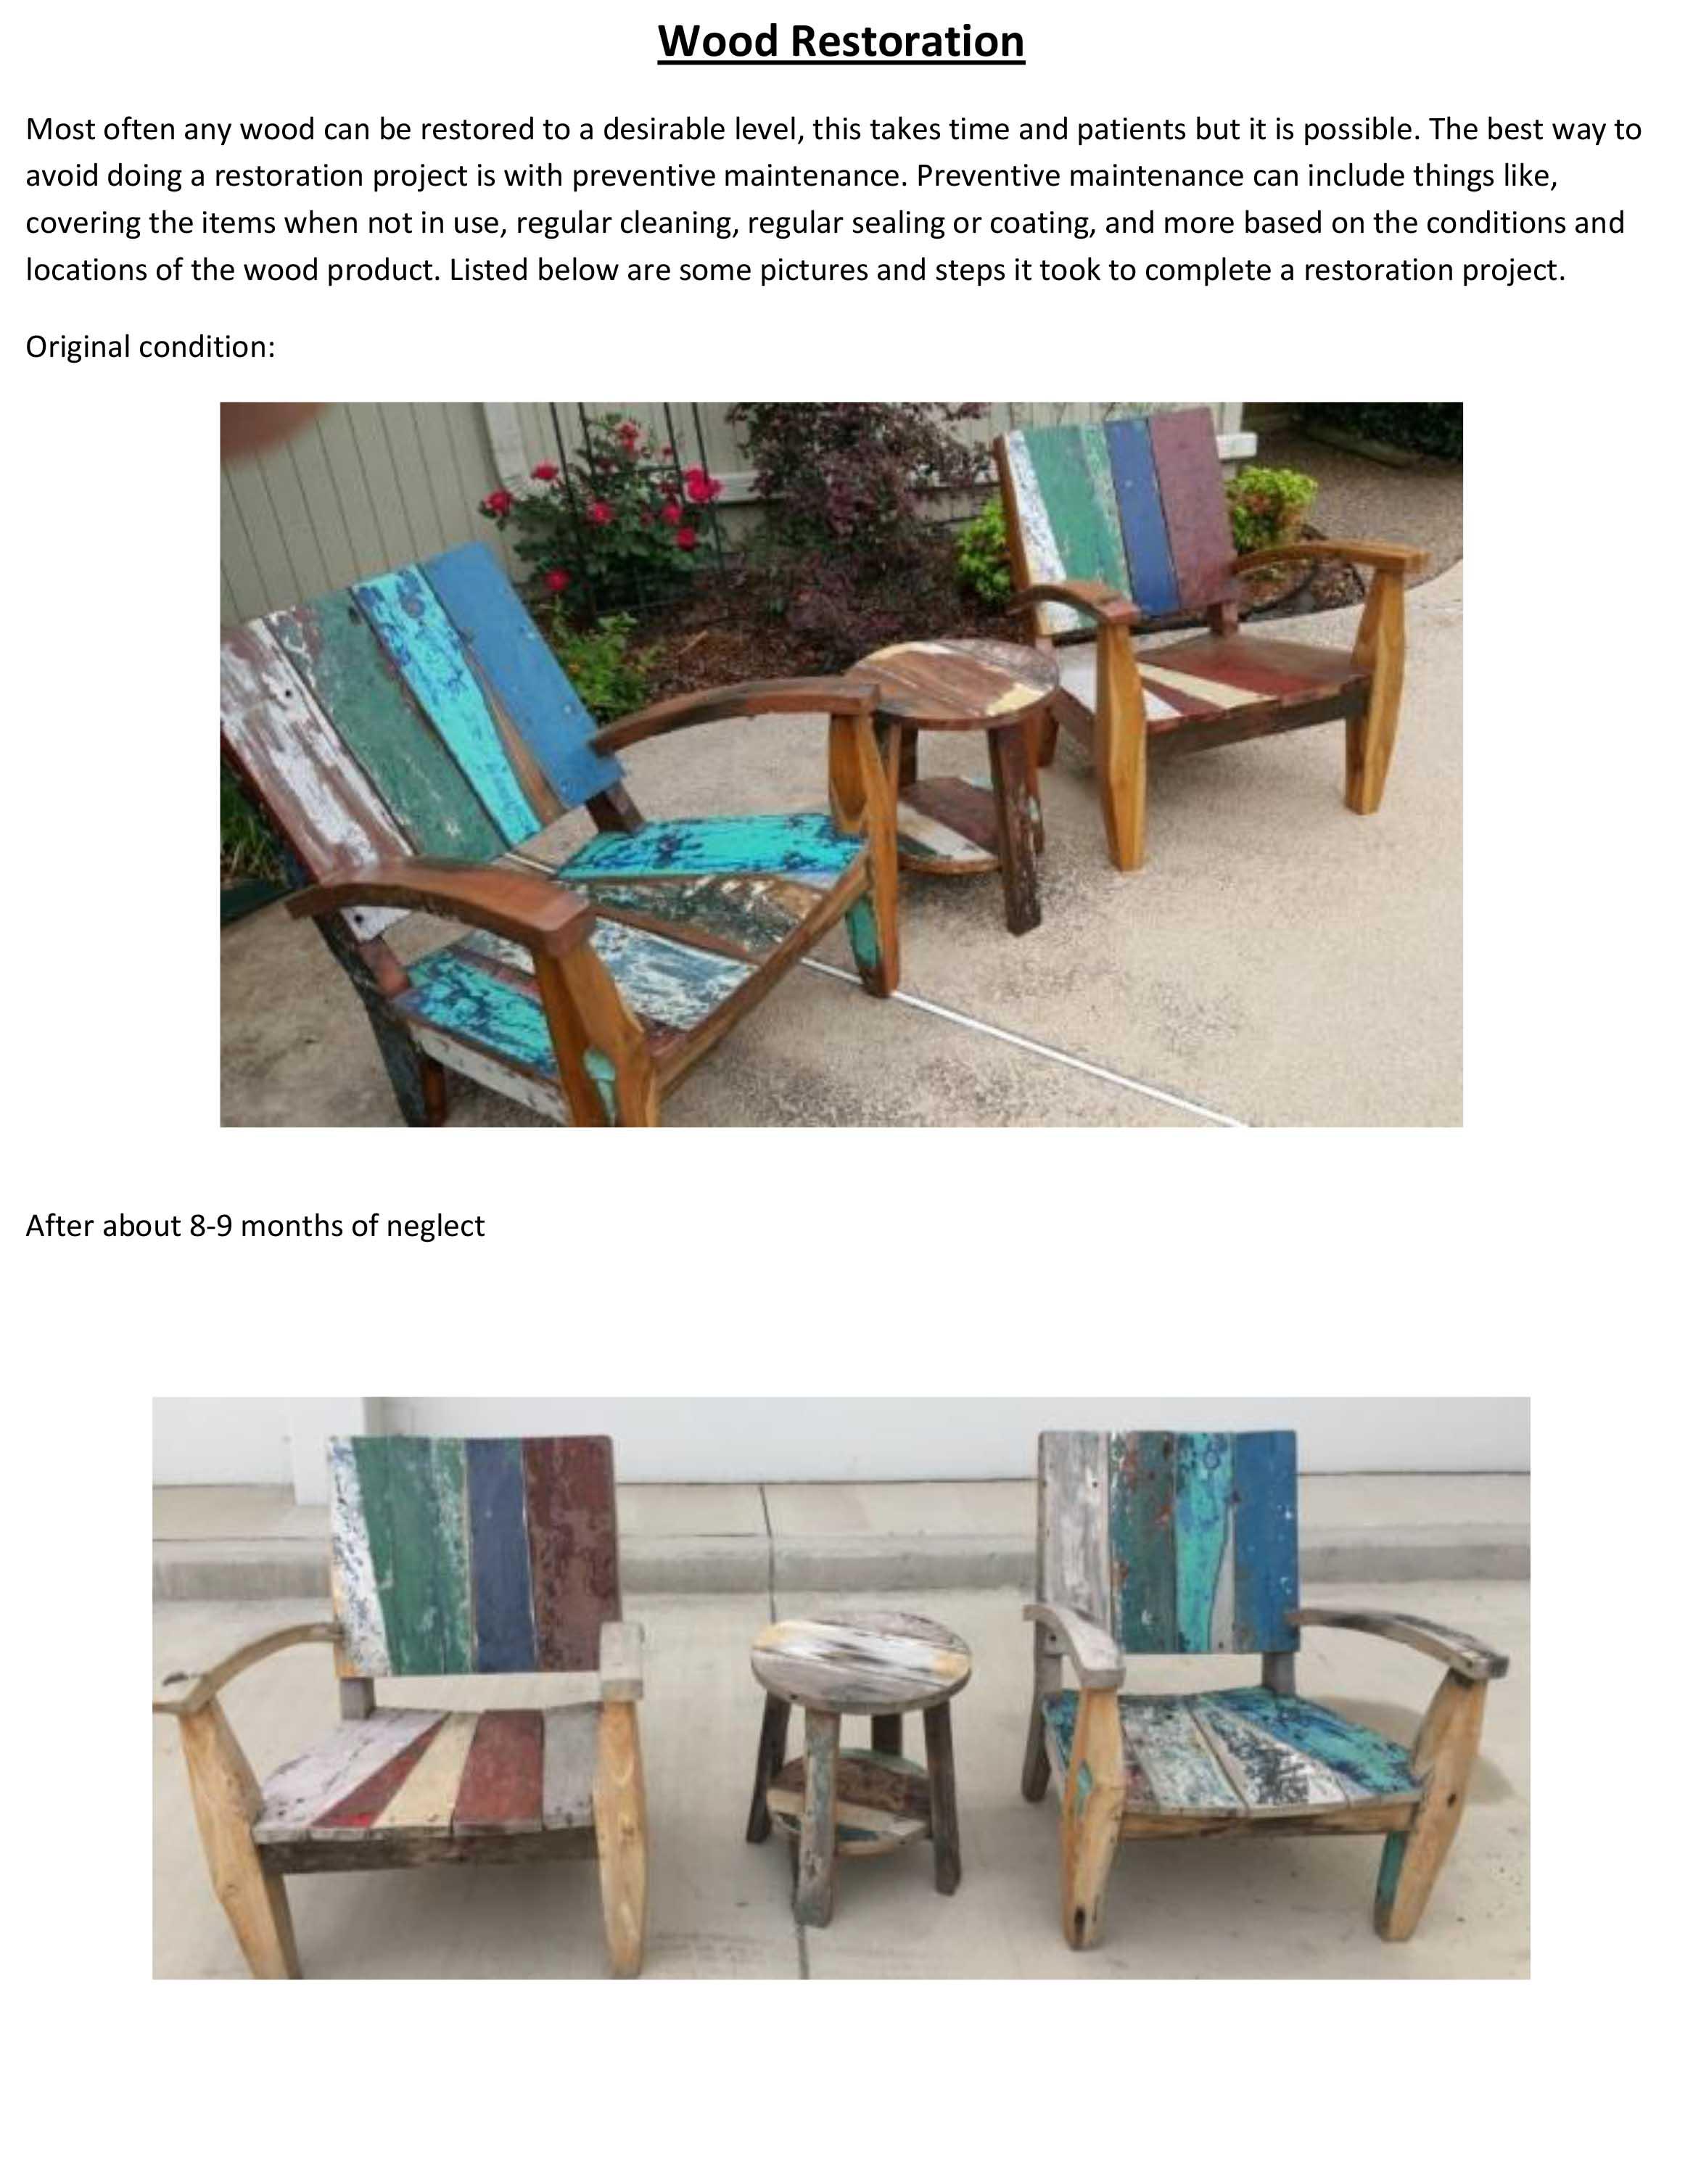 Wood Restoration-1.jpg